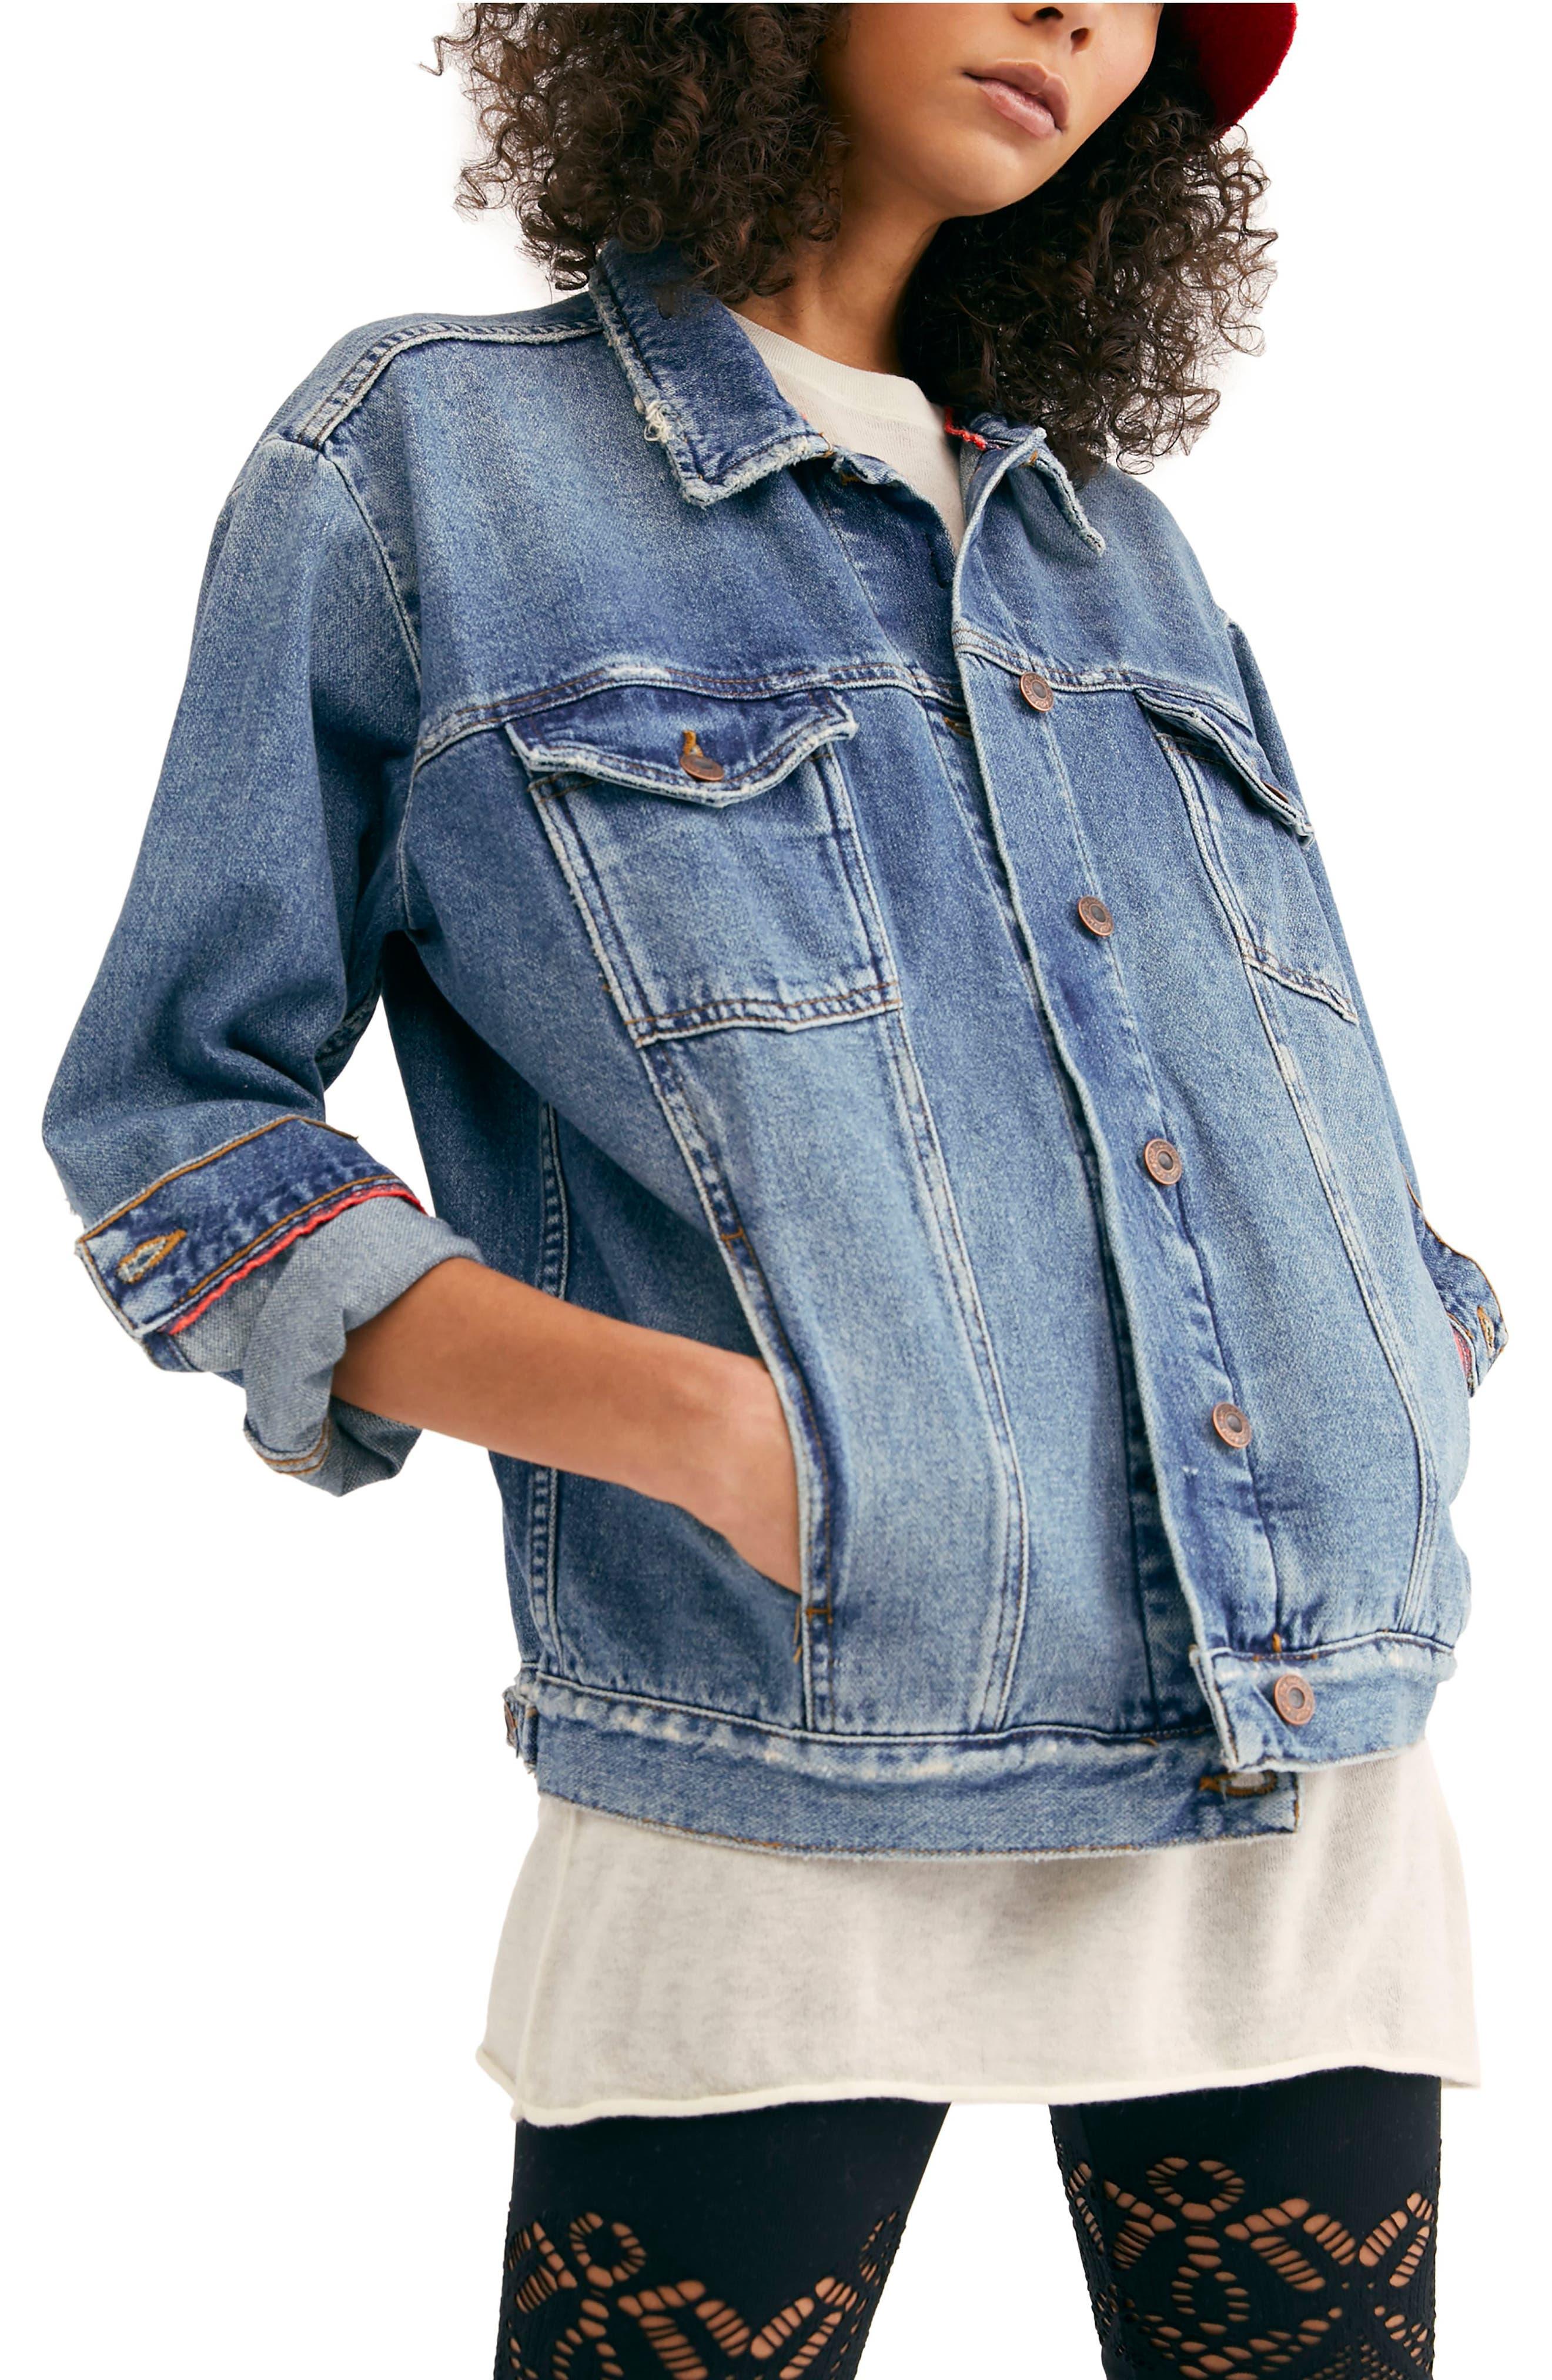 FREE PEOPLE, Ramona Denim Trucker Jacket, Main thumbnail 1, color, INDIGO BLUE